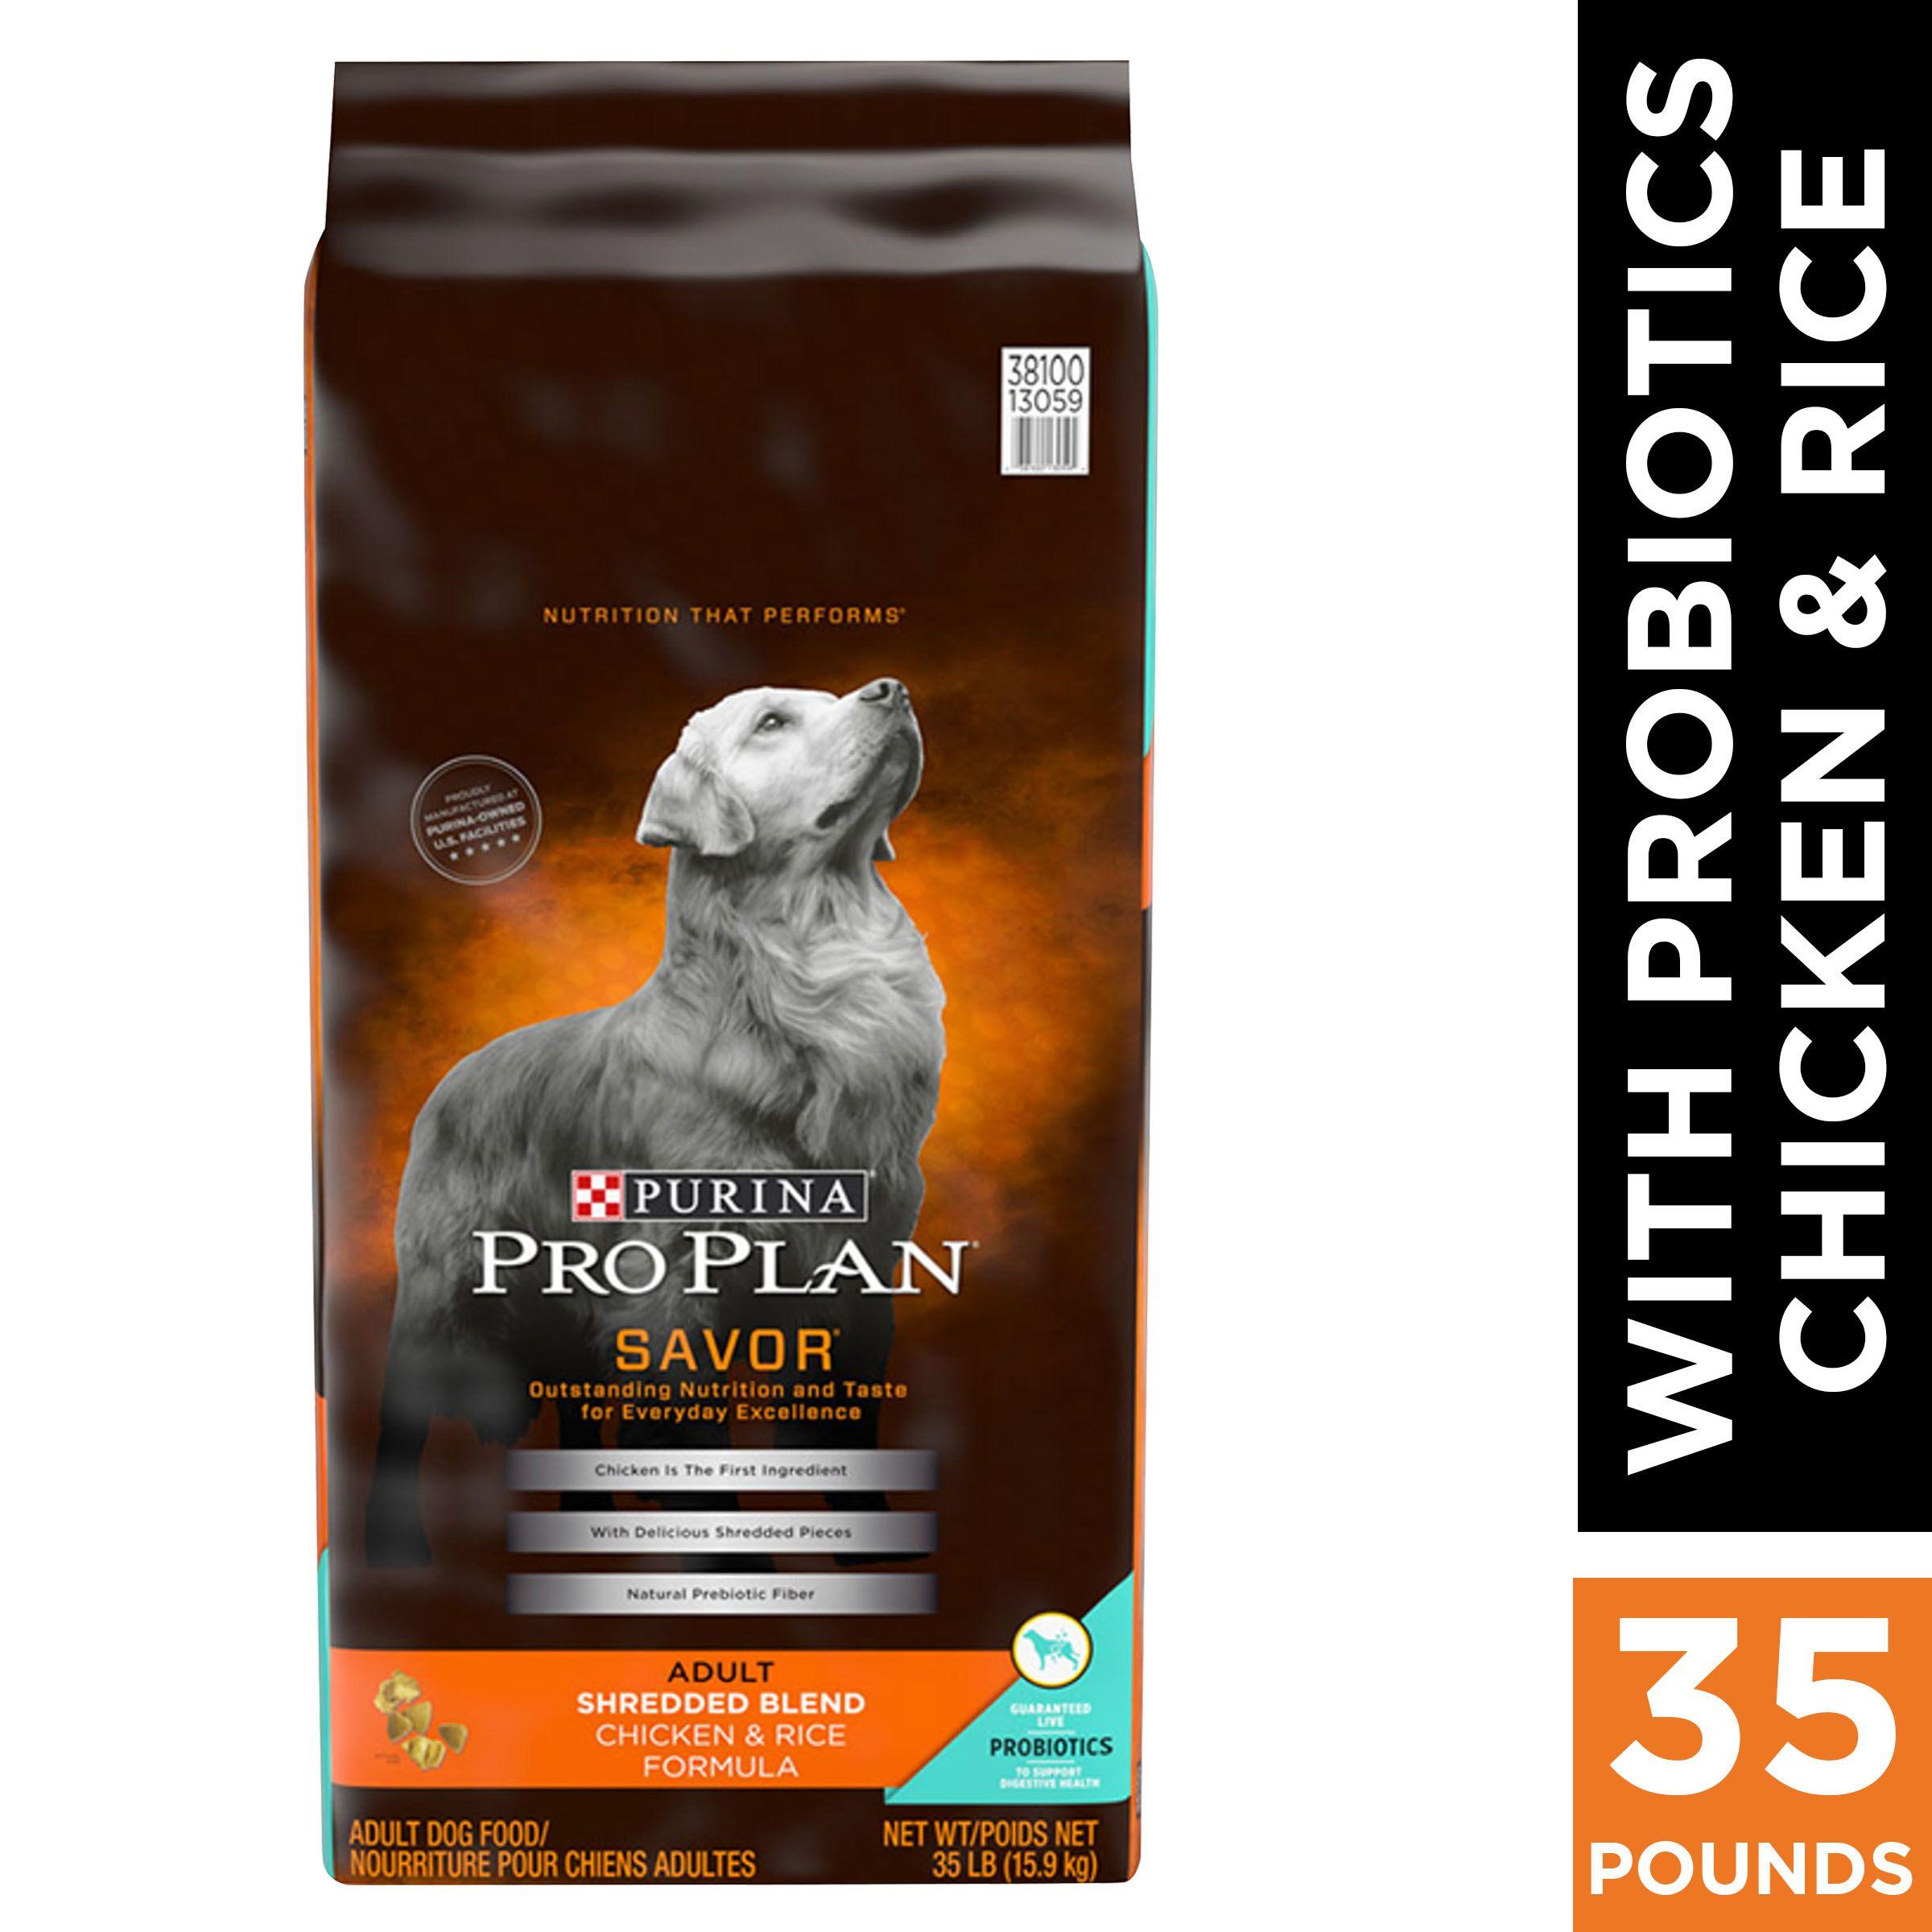 Purina Pro Plan With Probiotics Dry Dog Food Savor Shredded Blend